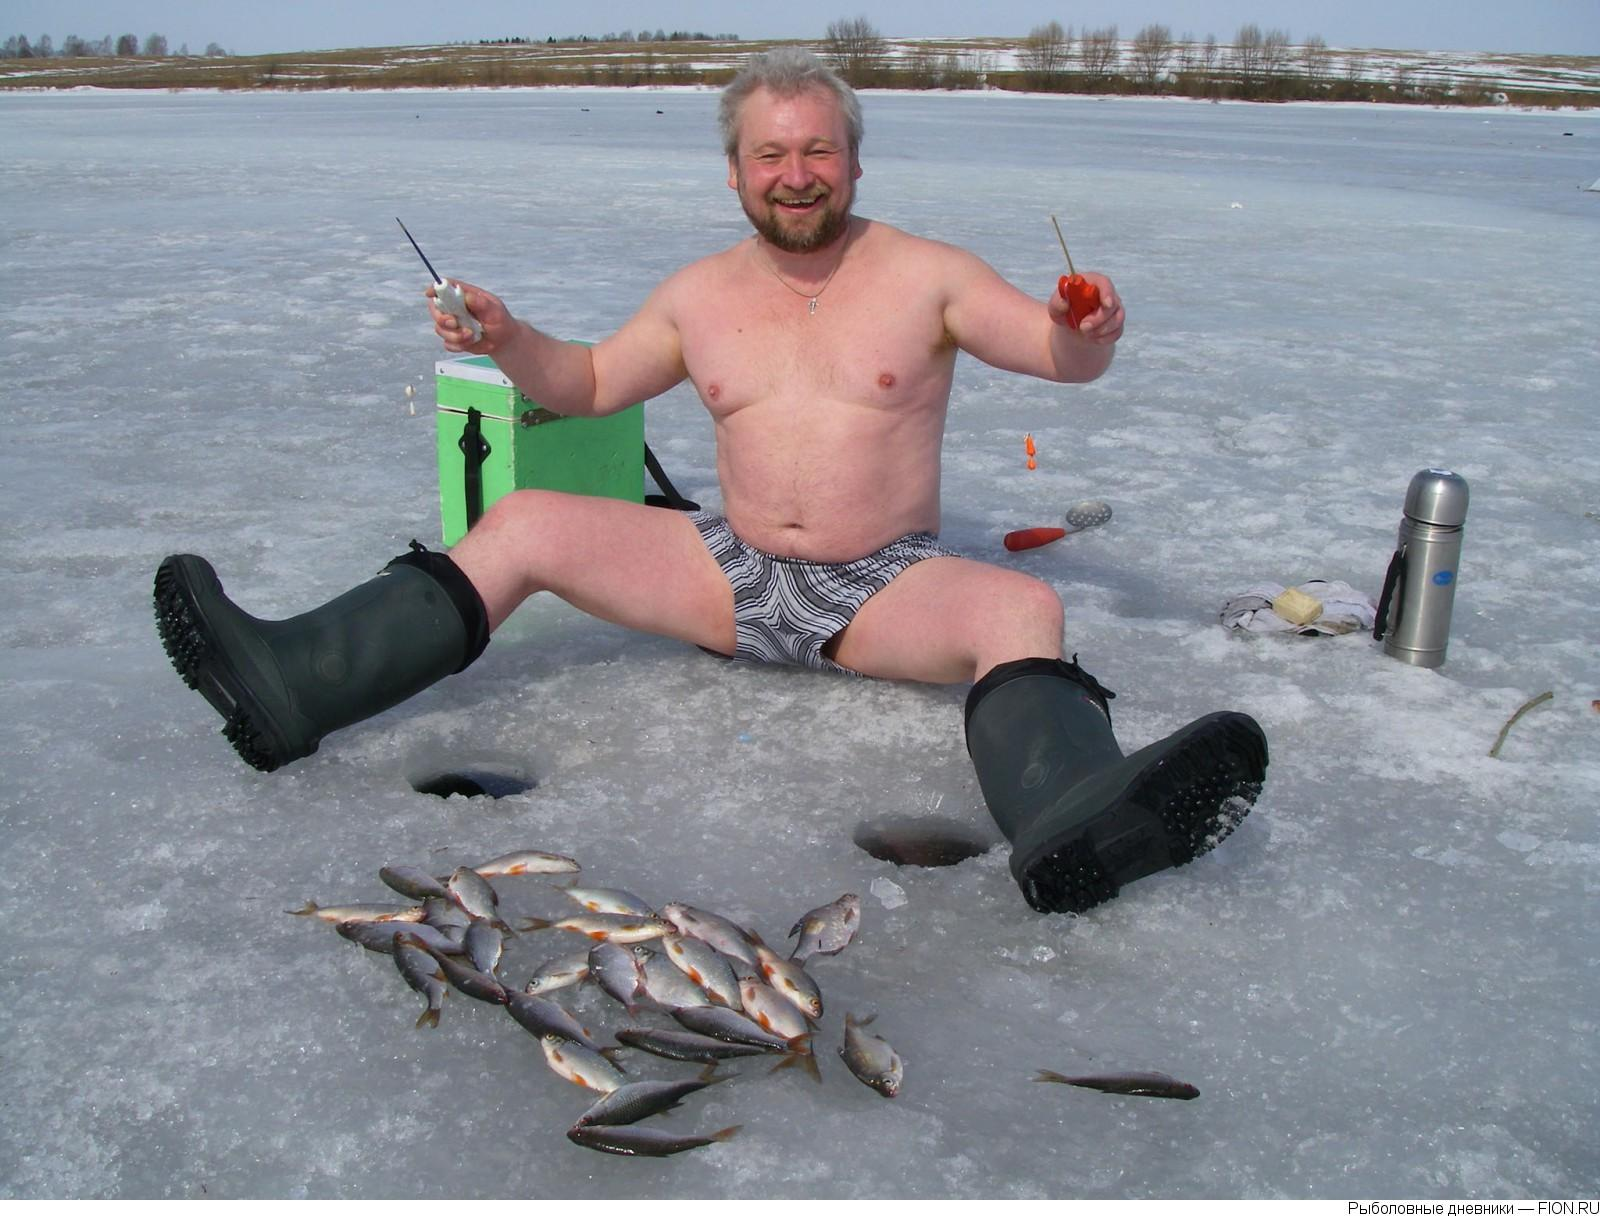 прикол ролик про рыбалку